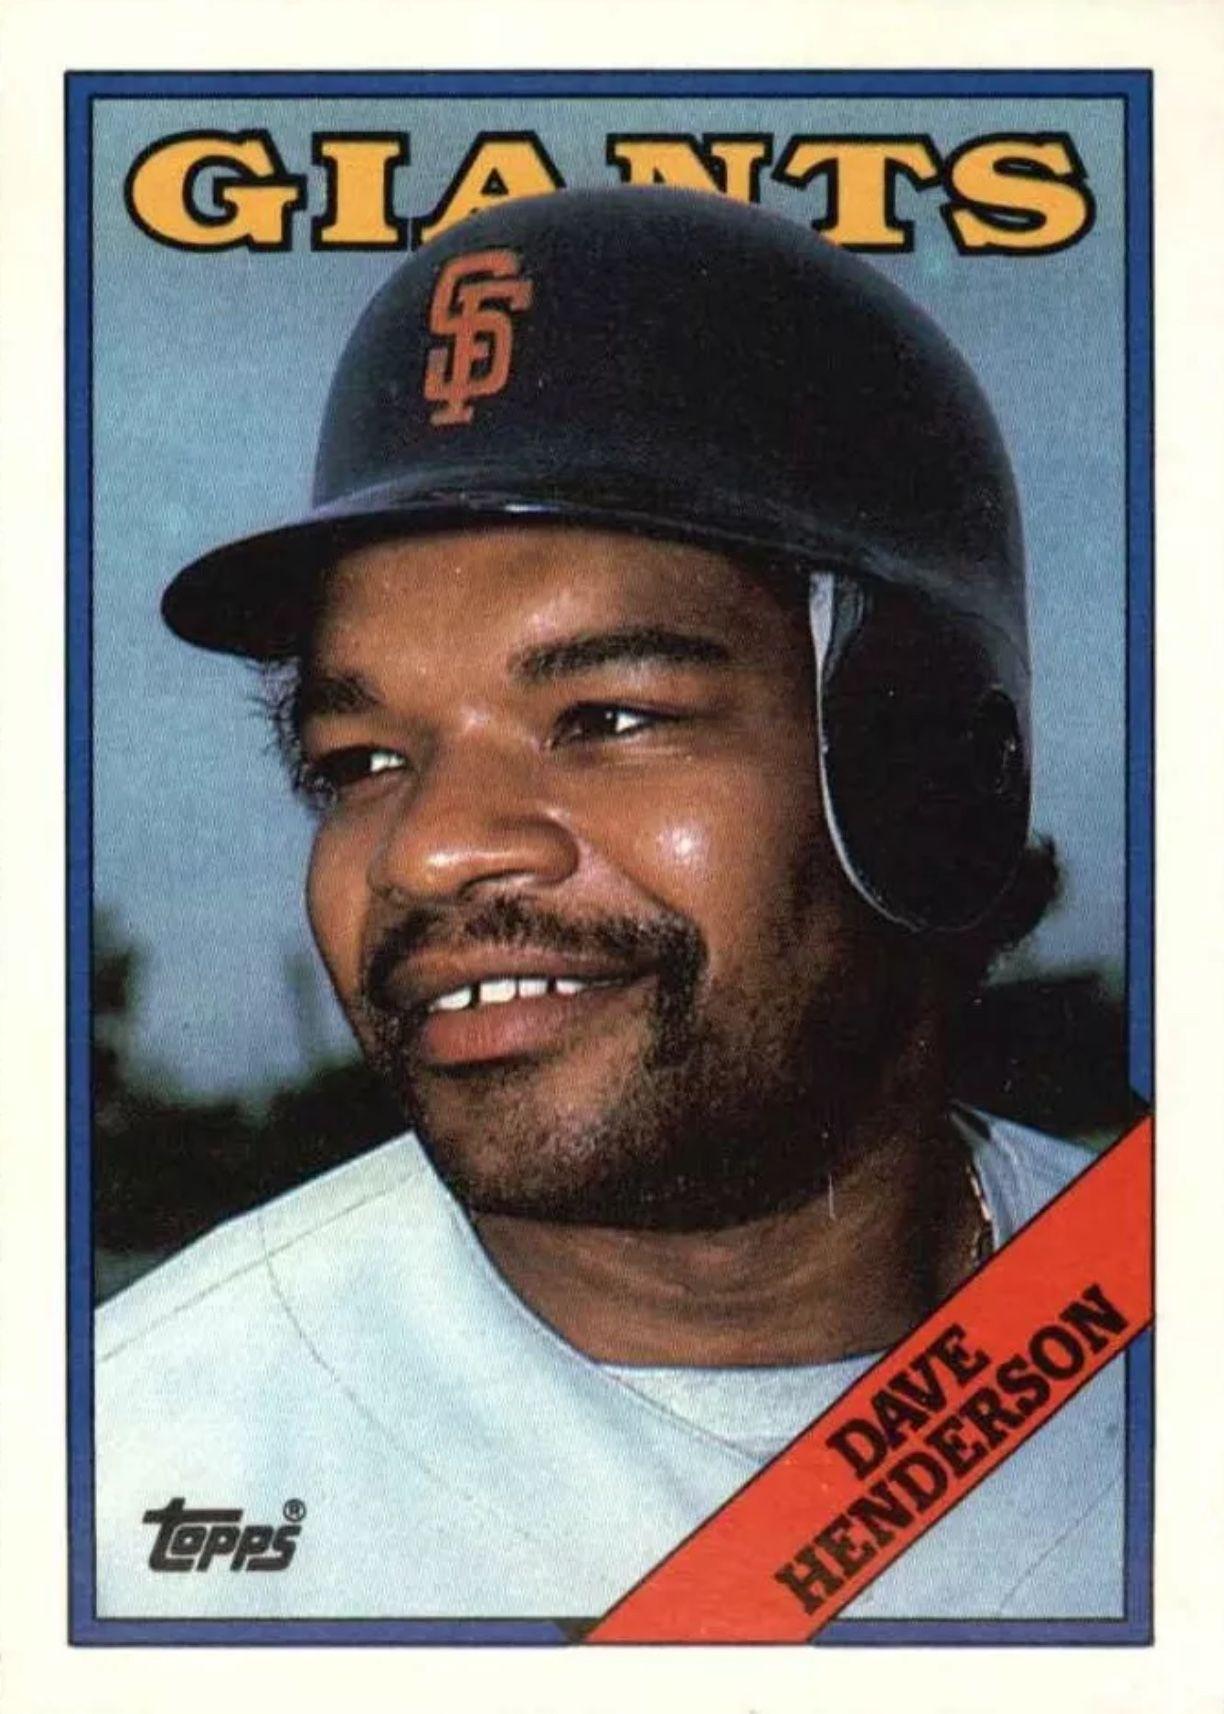 1988 topps dave henderson national league baseball